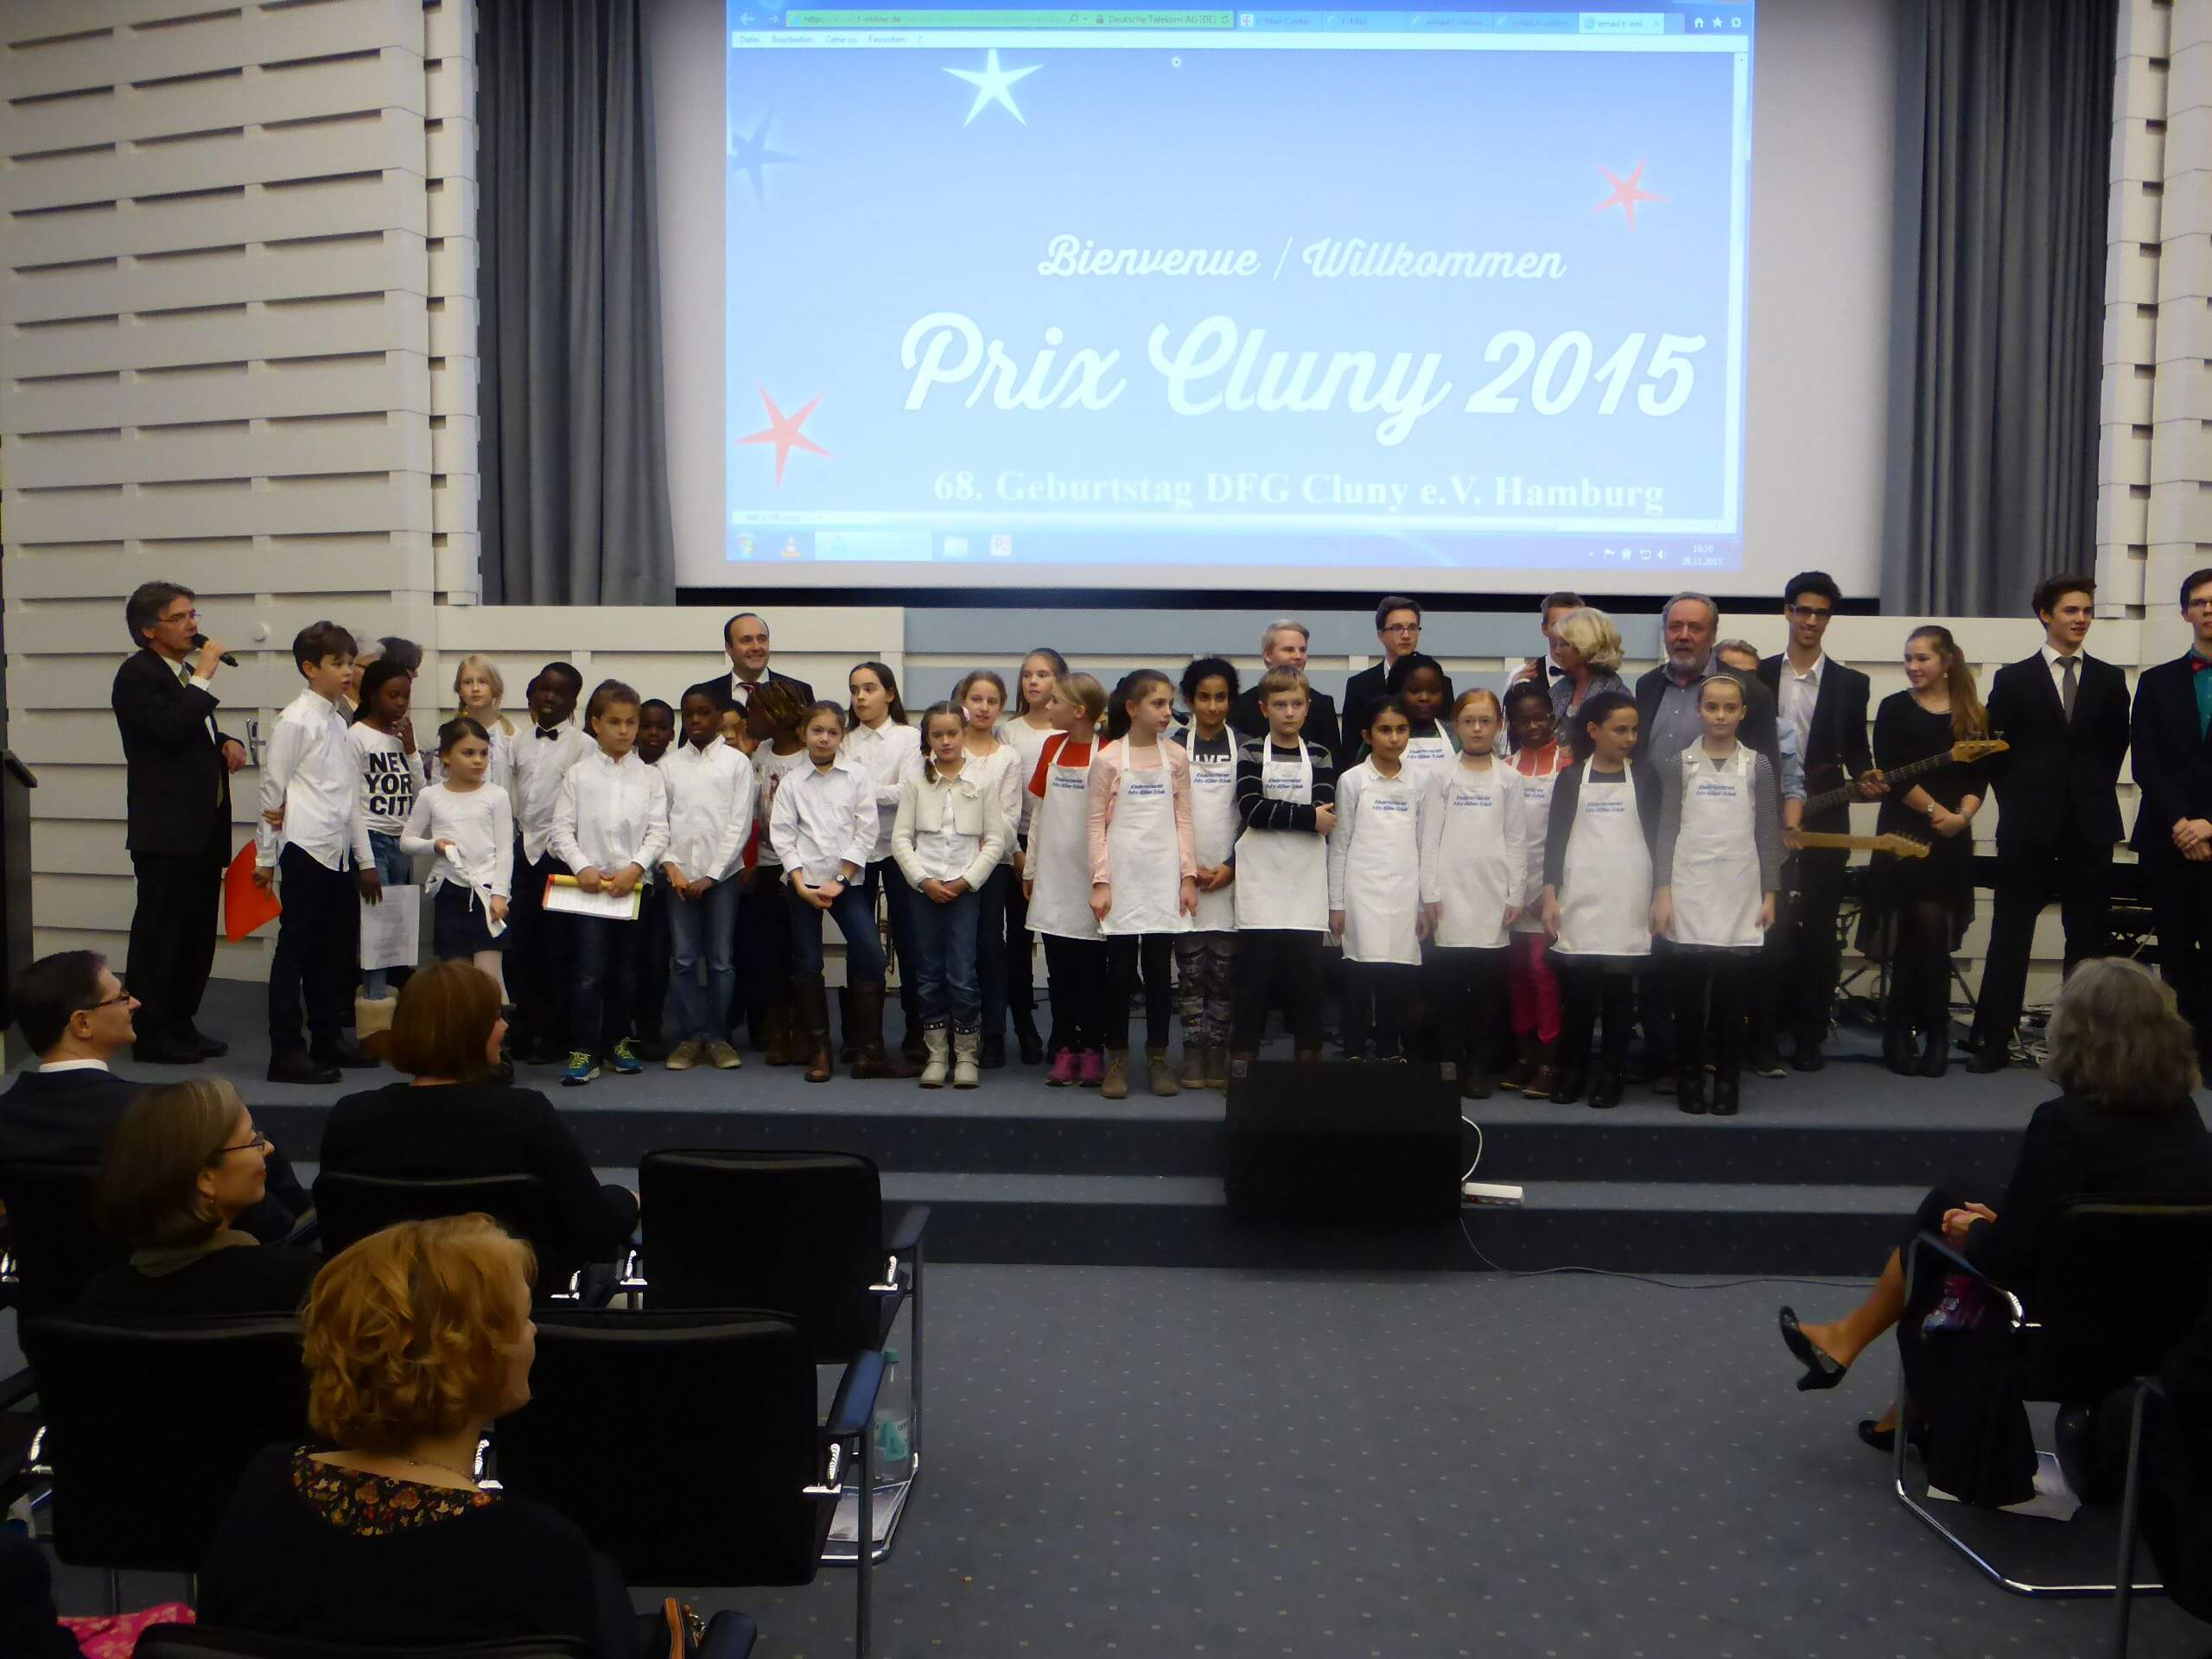 Prix Cluny 28.11.15 228